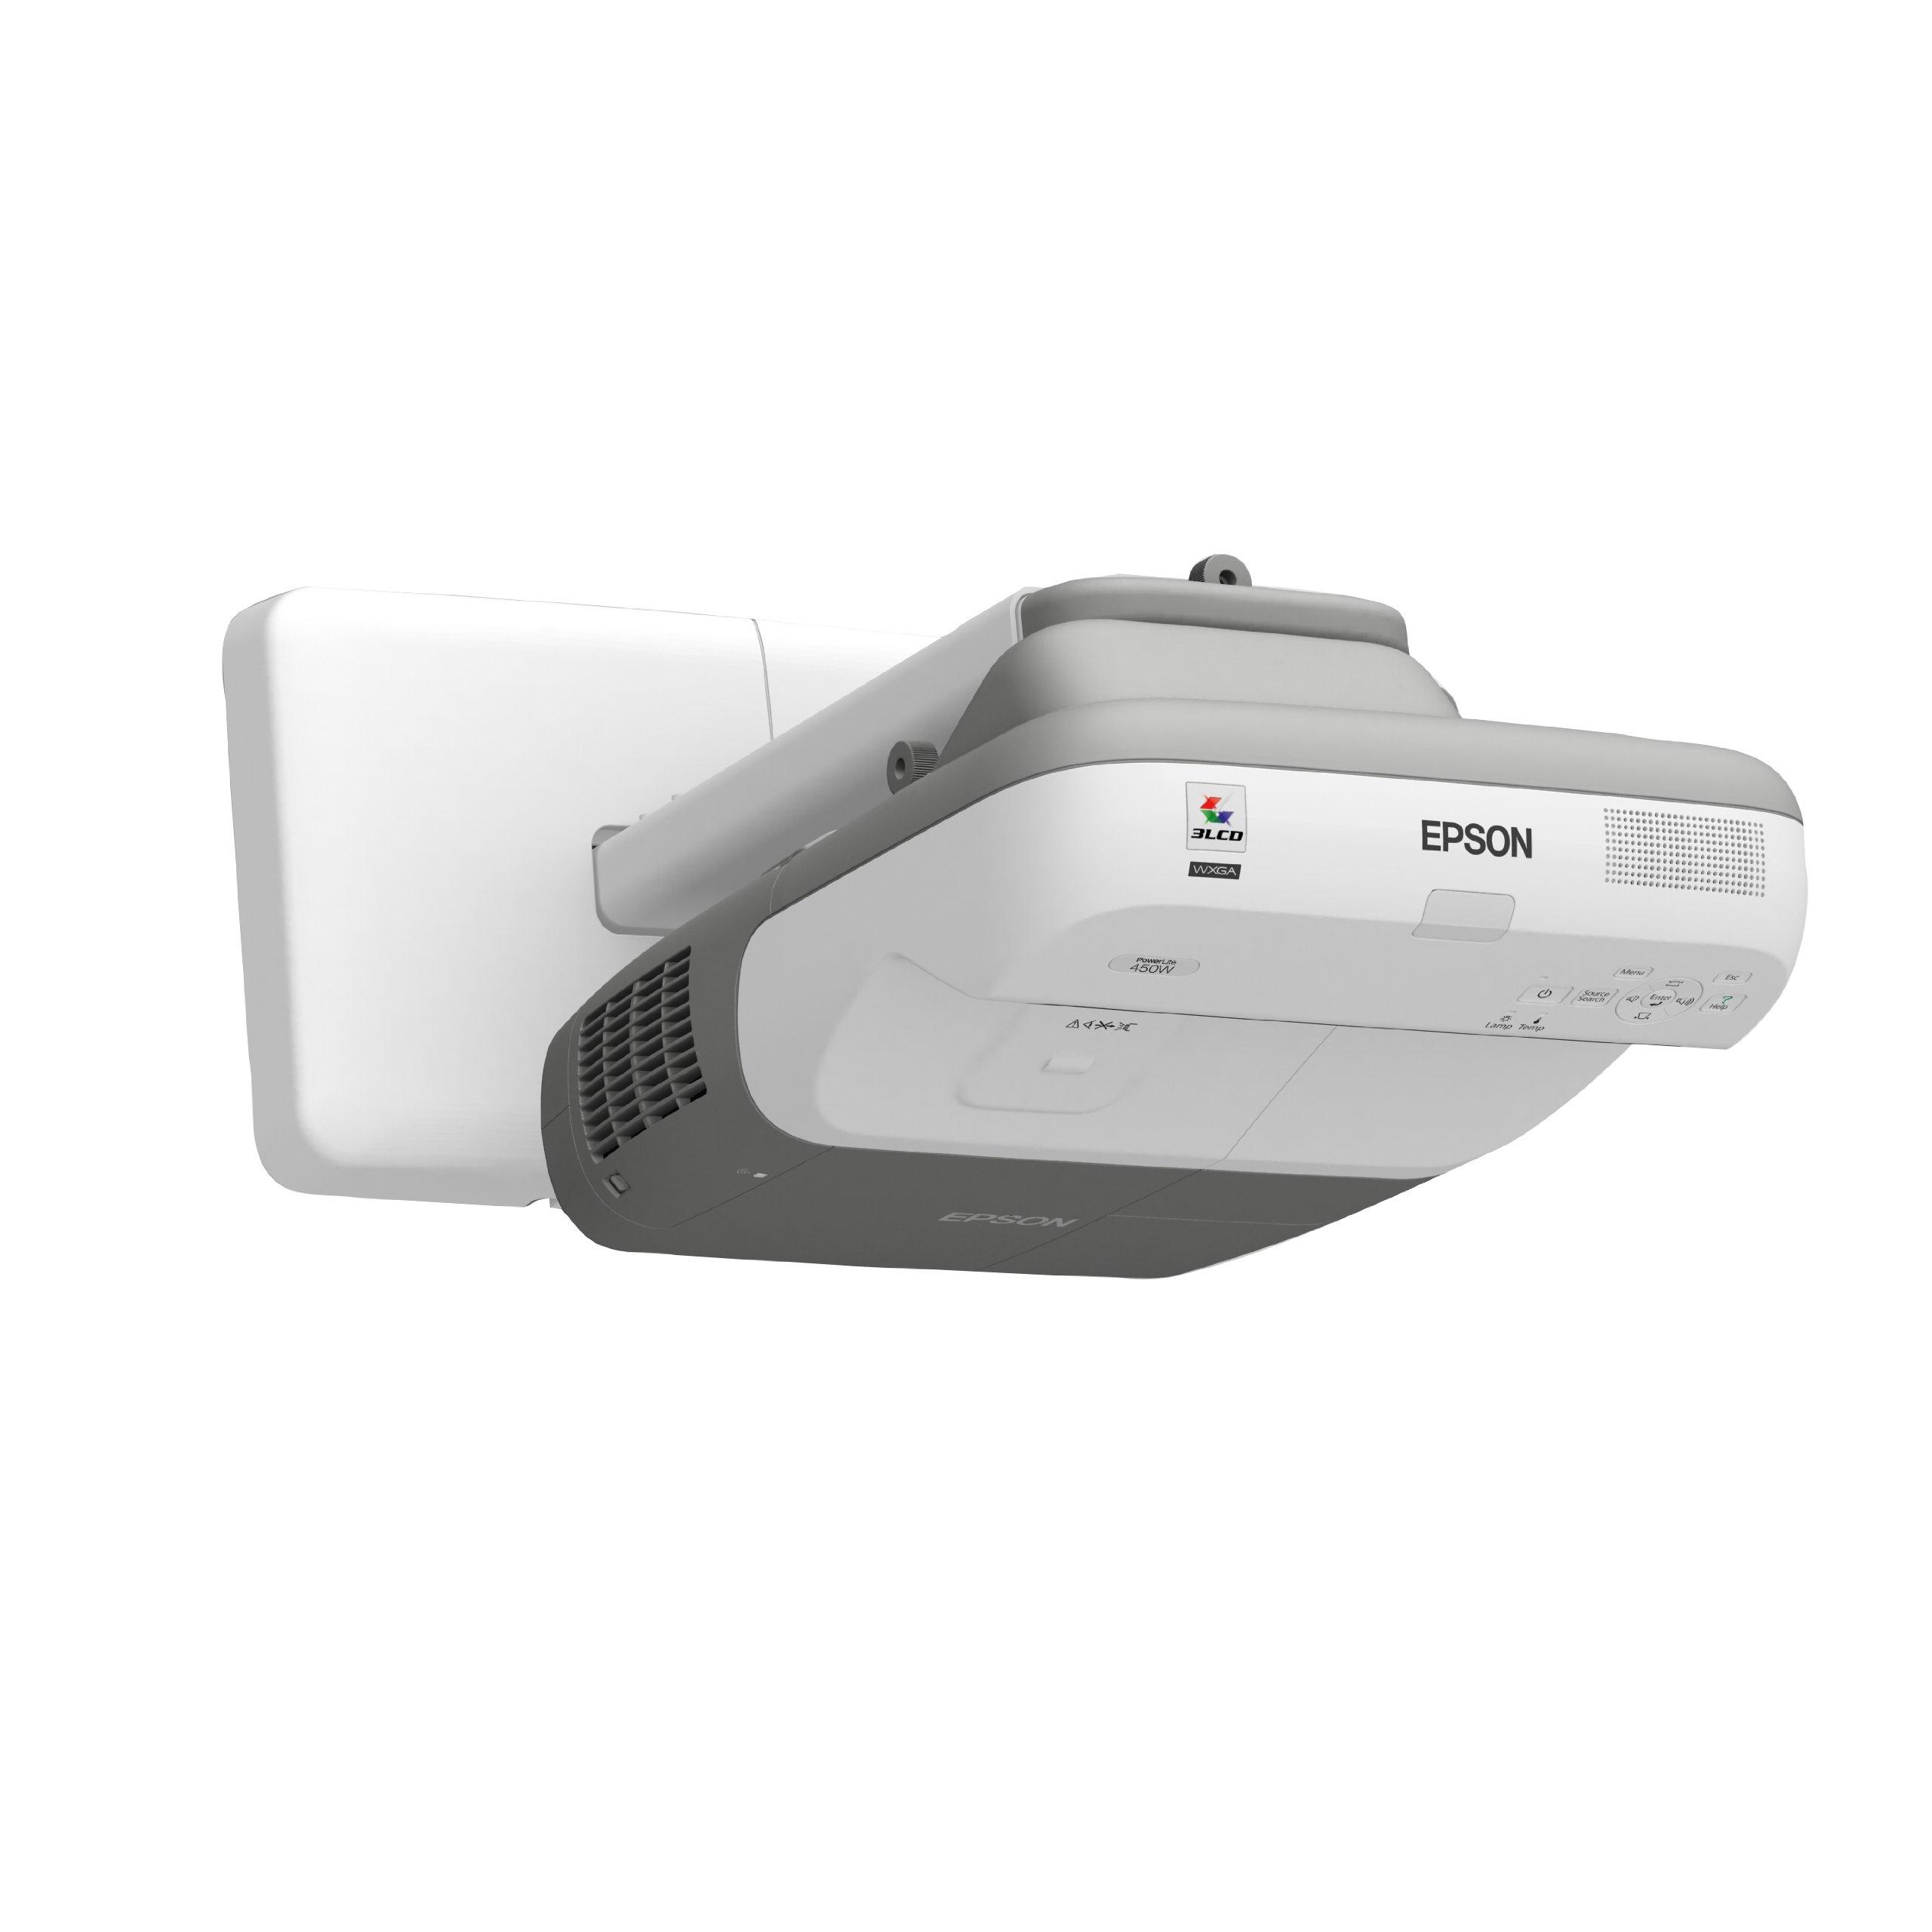 Epson PowerLite 450W MultiMedia Projector (V11H318020) by Epson